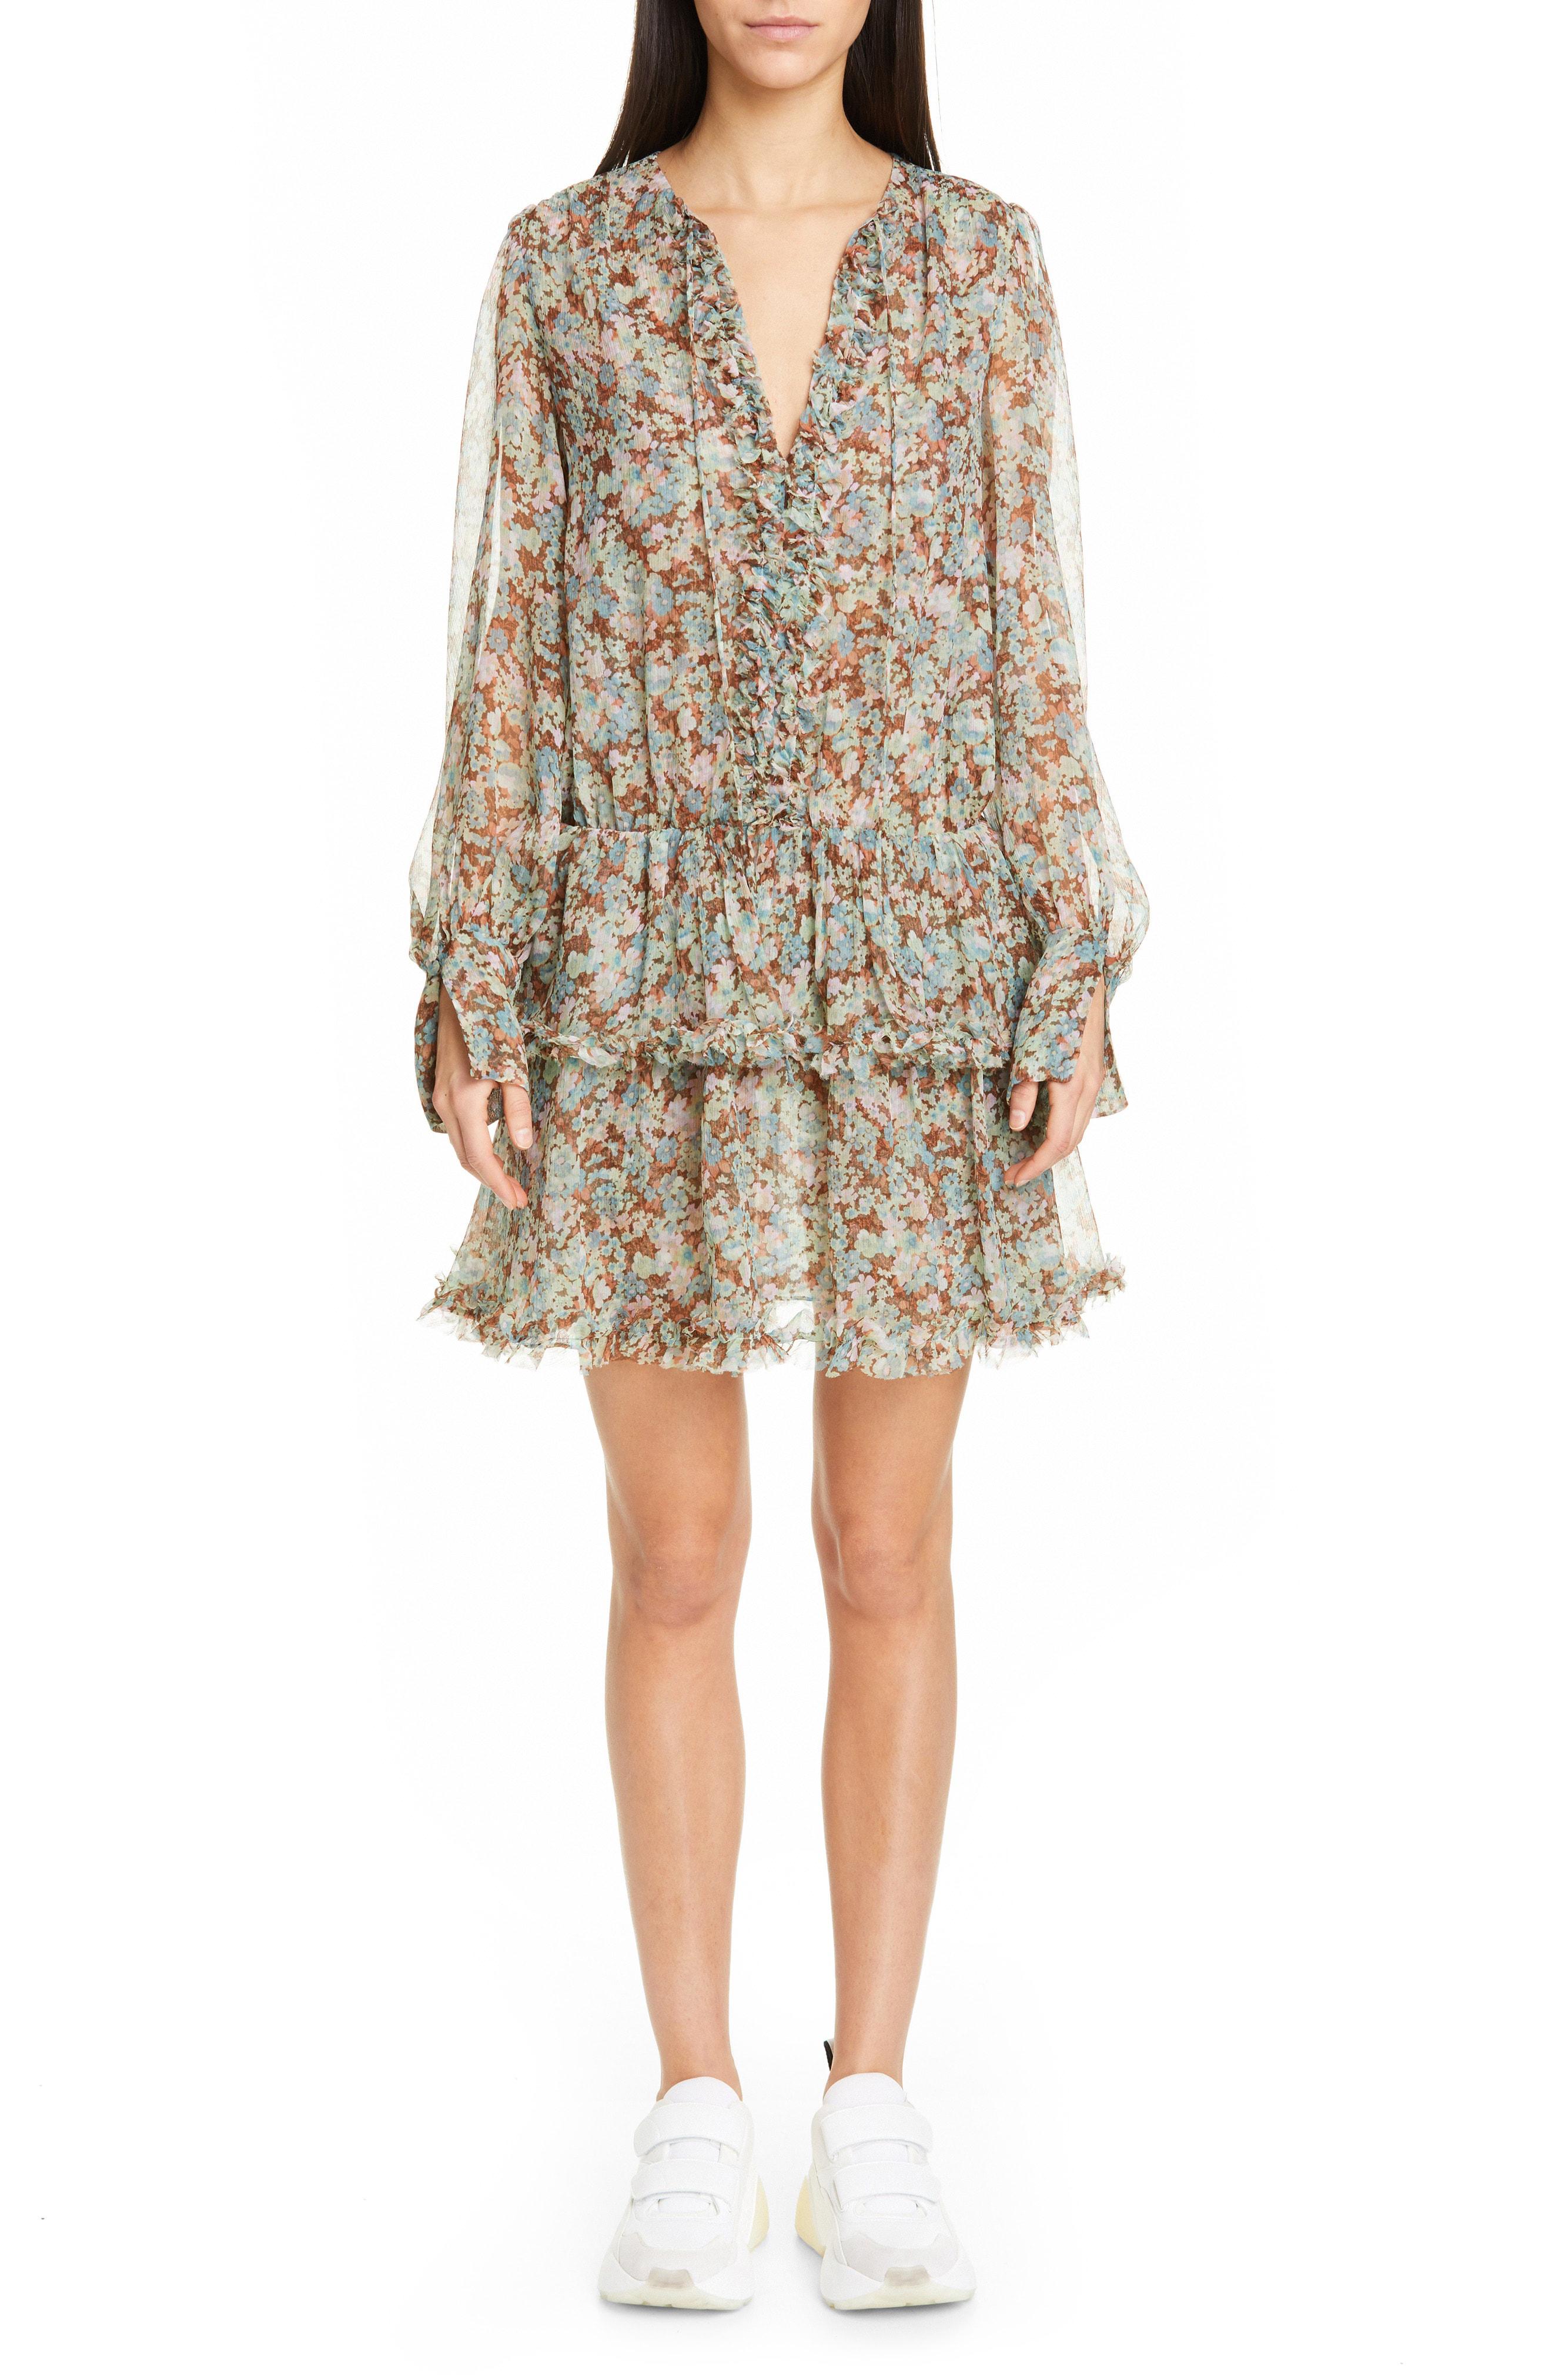 834061ebde13b Stella Mccartney Meadow Floral-Print Long-Sleeve Dress In Multicolour